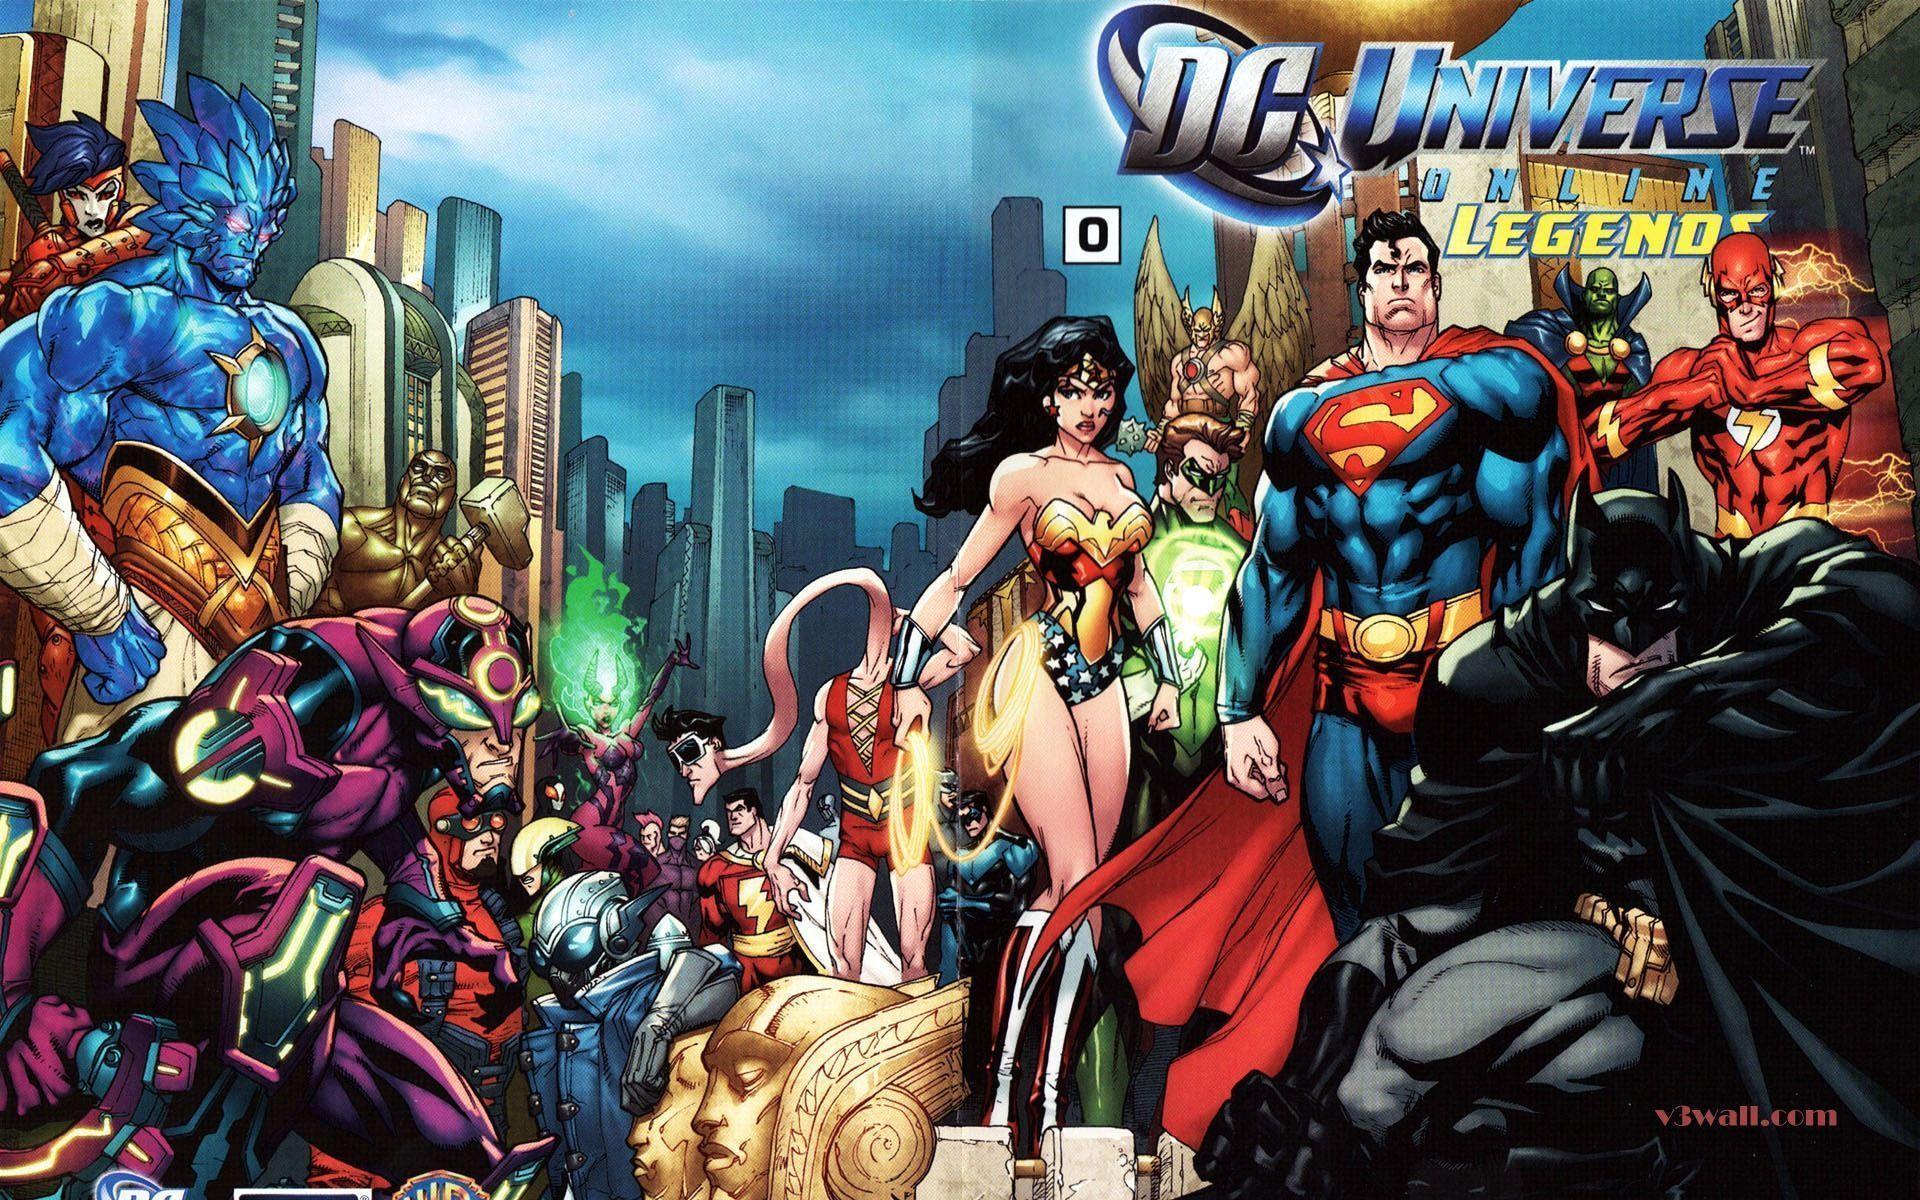 DC Universe Wallpapers - Wallpaper Cave